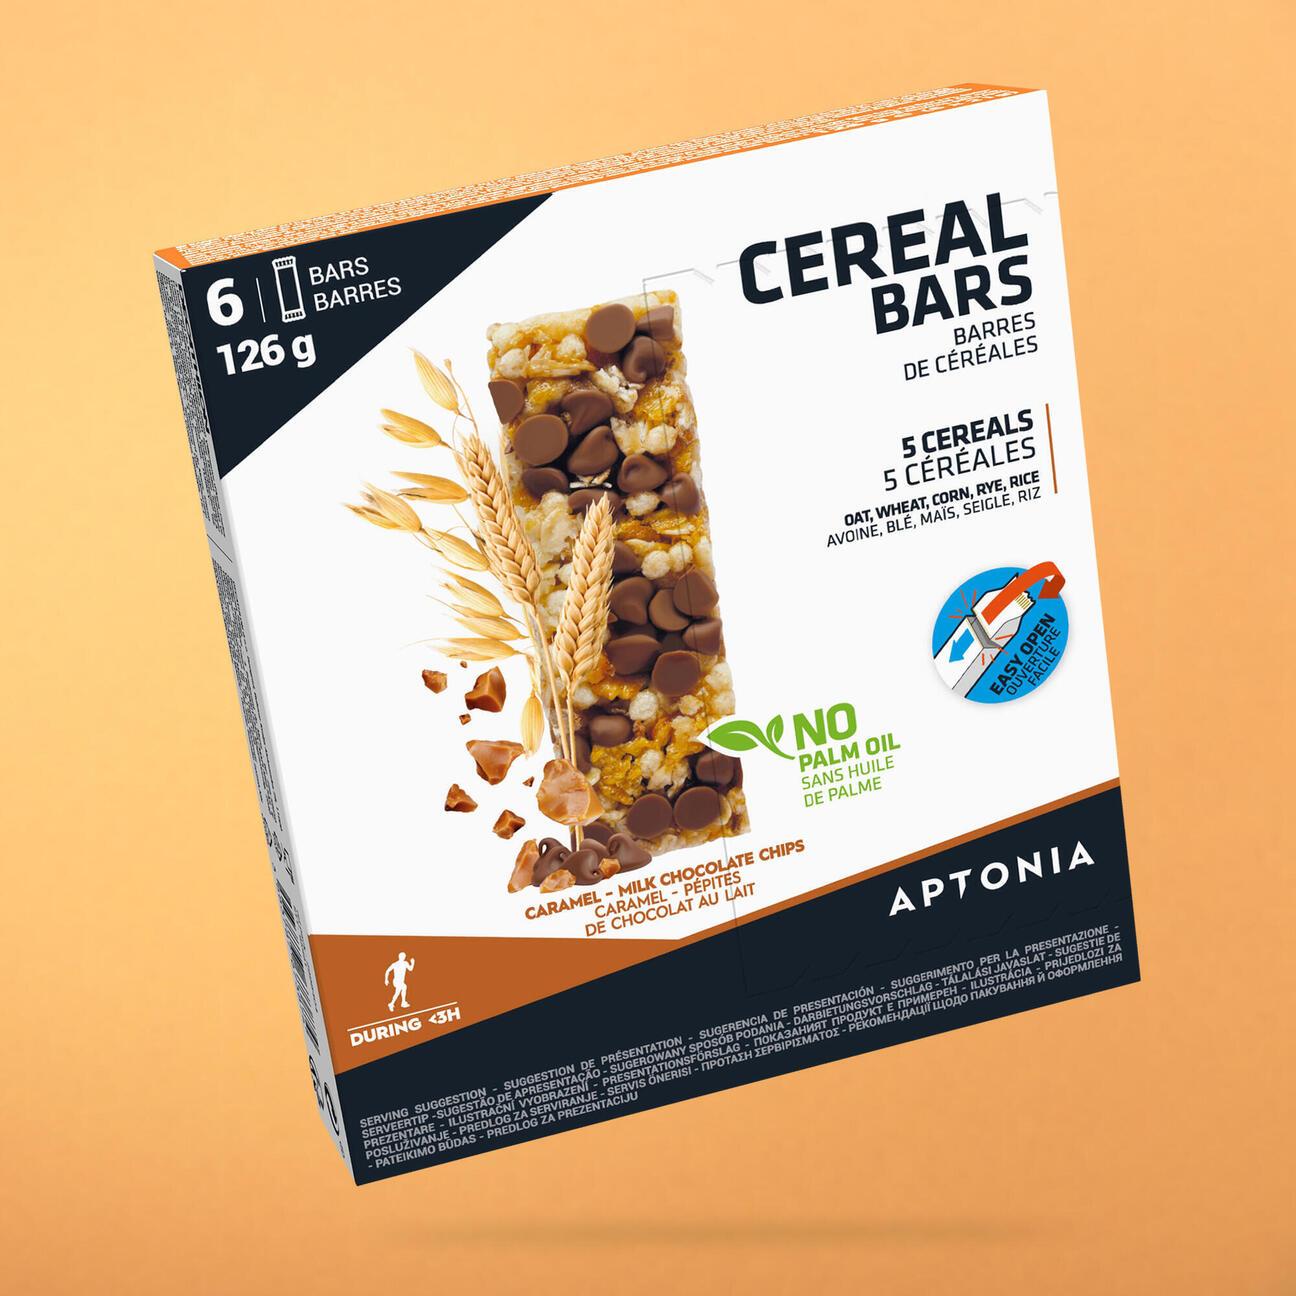 barre-cereales-choco-caramel-6-x-21g